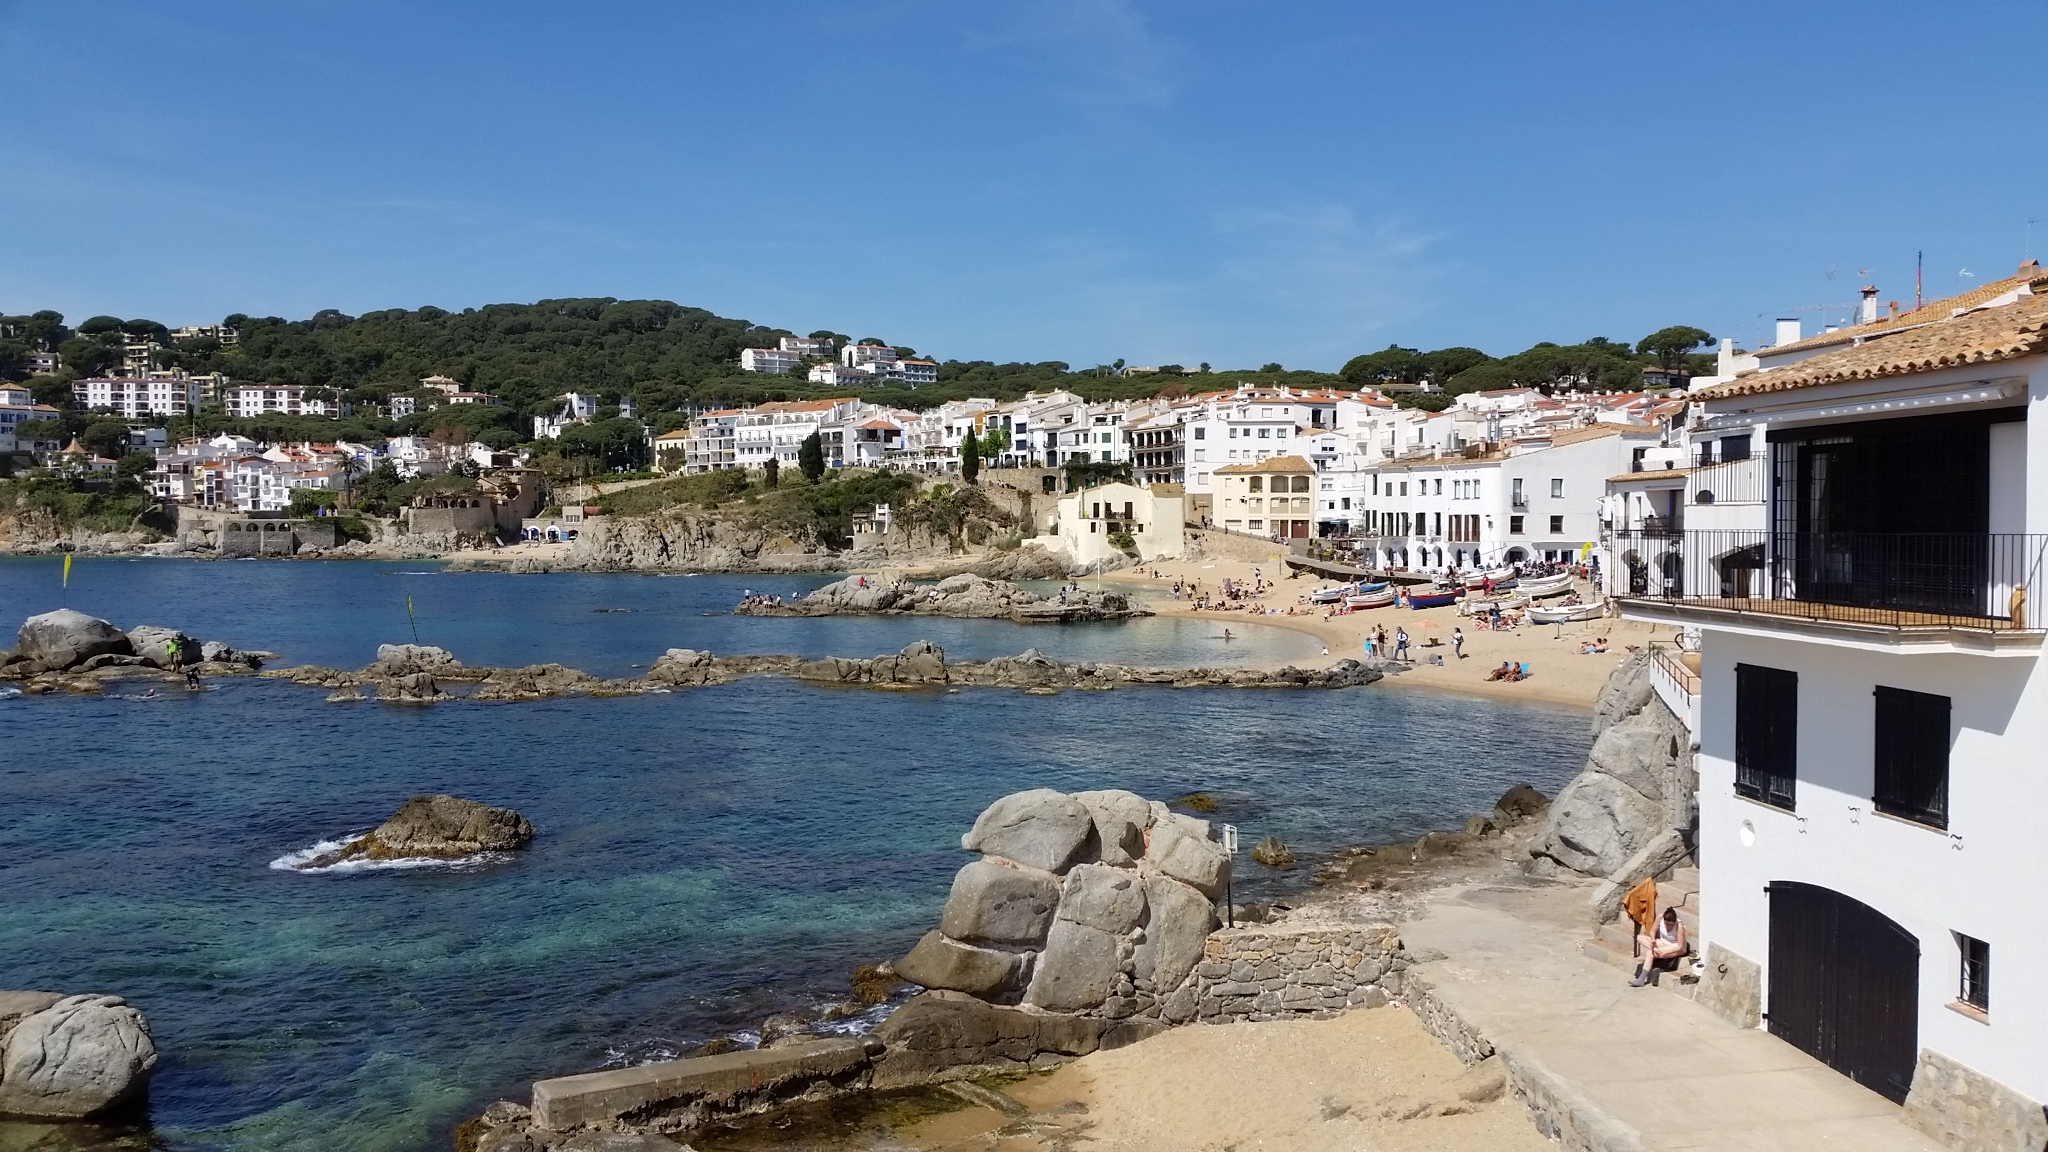 Catalonië - Calella de Palafrugell